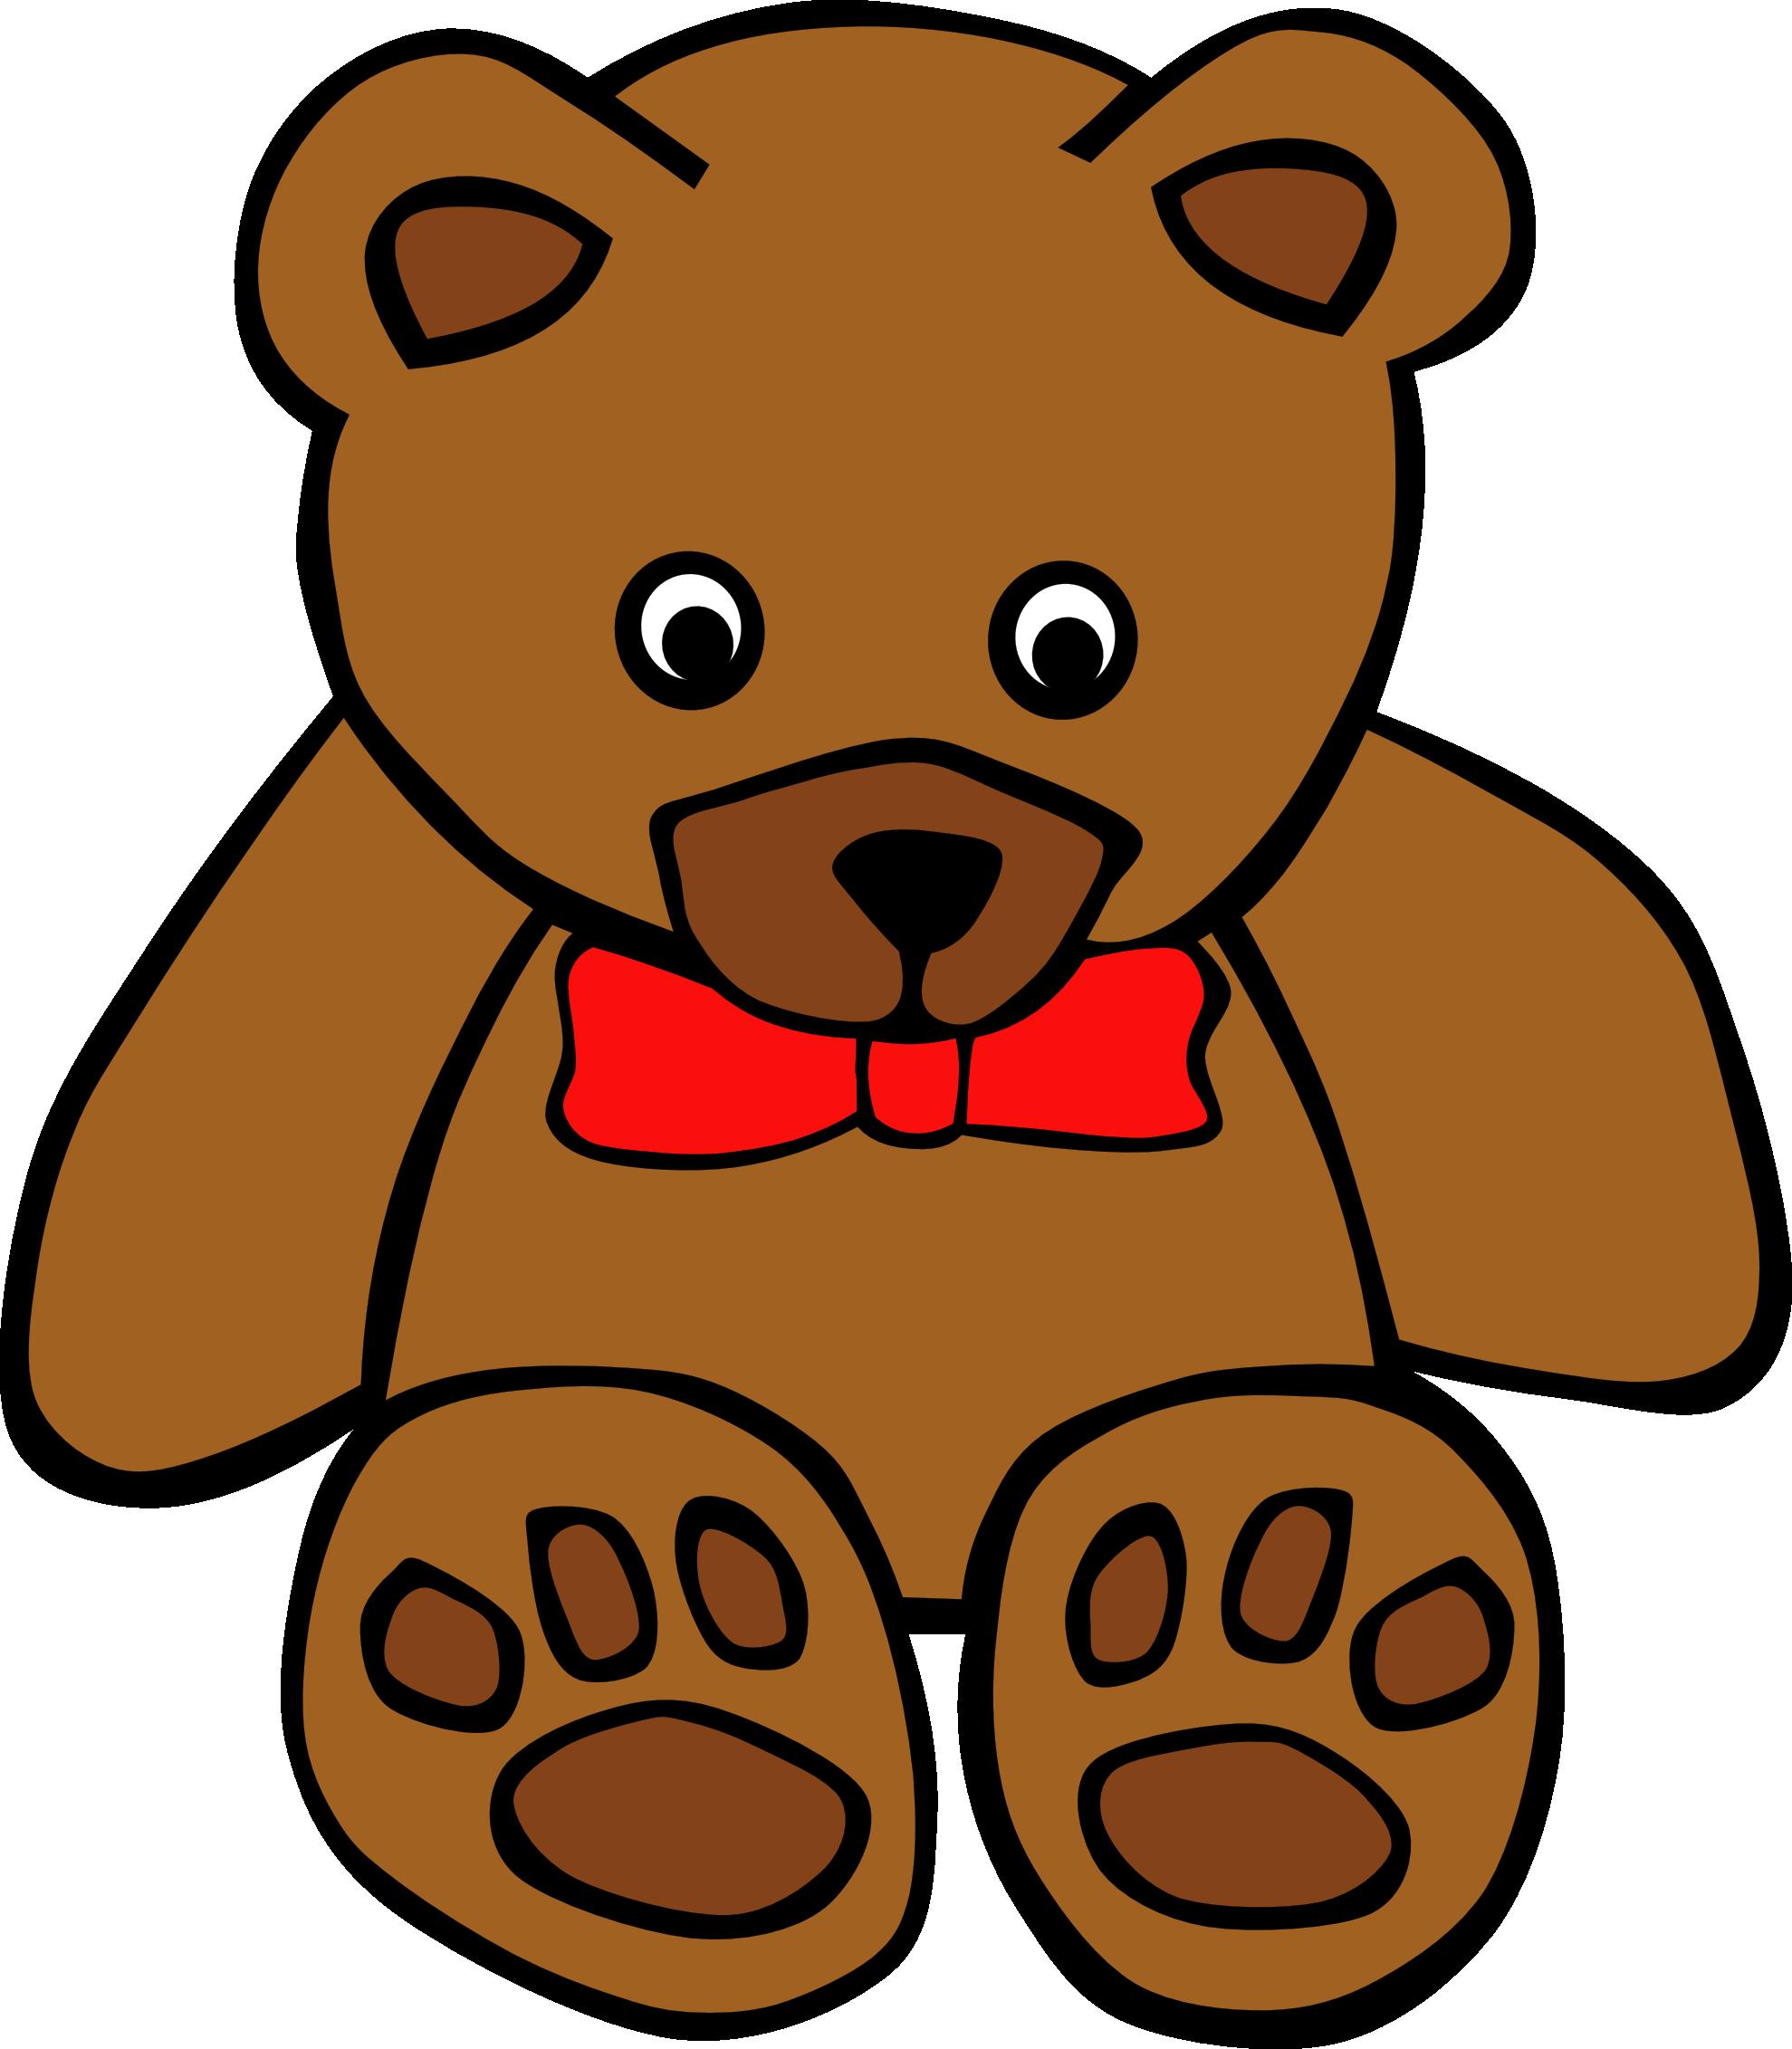 Teddy Bear Clipart Free Clipart Images 4-Teddy bear clipart free clipart images 4-16